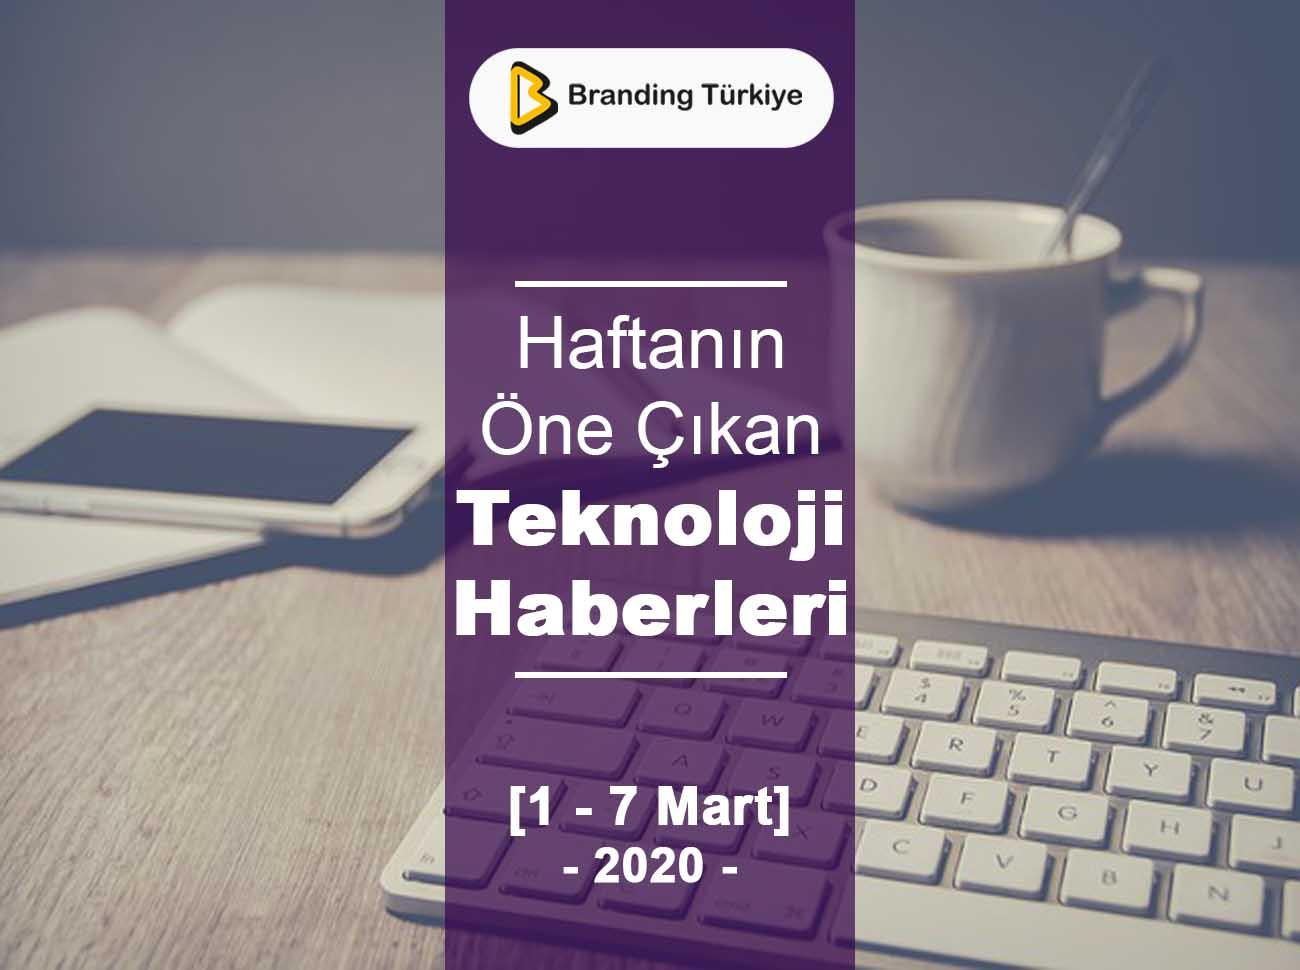 Teknoloji Haberleri 1 - 7 Mart 2020